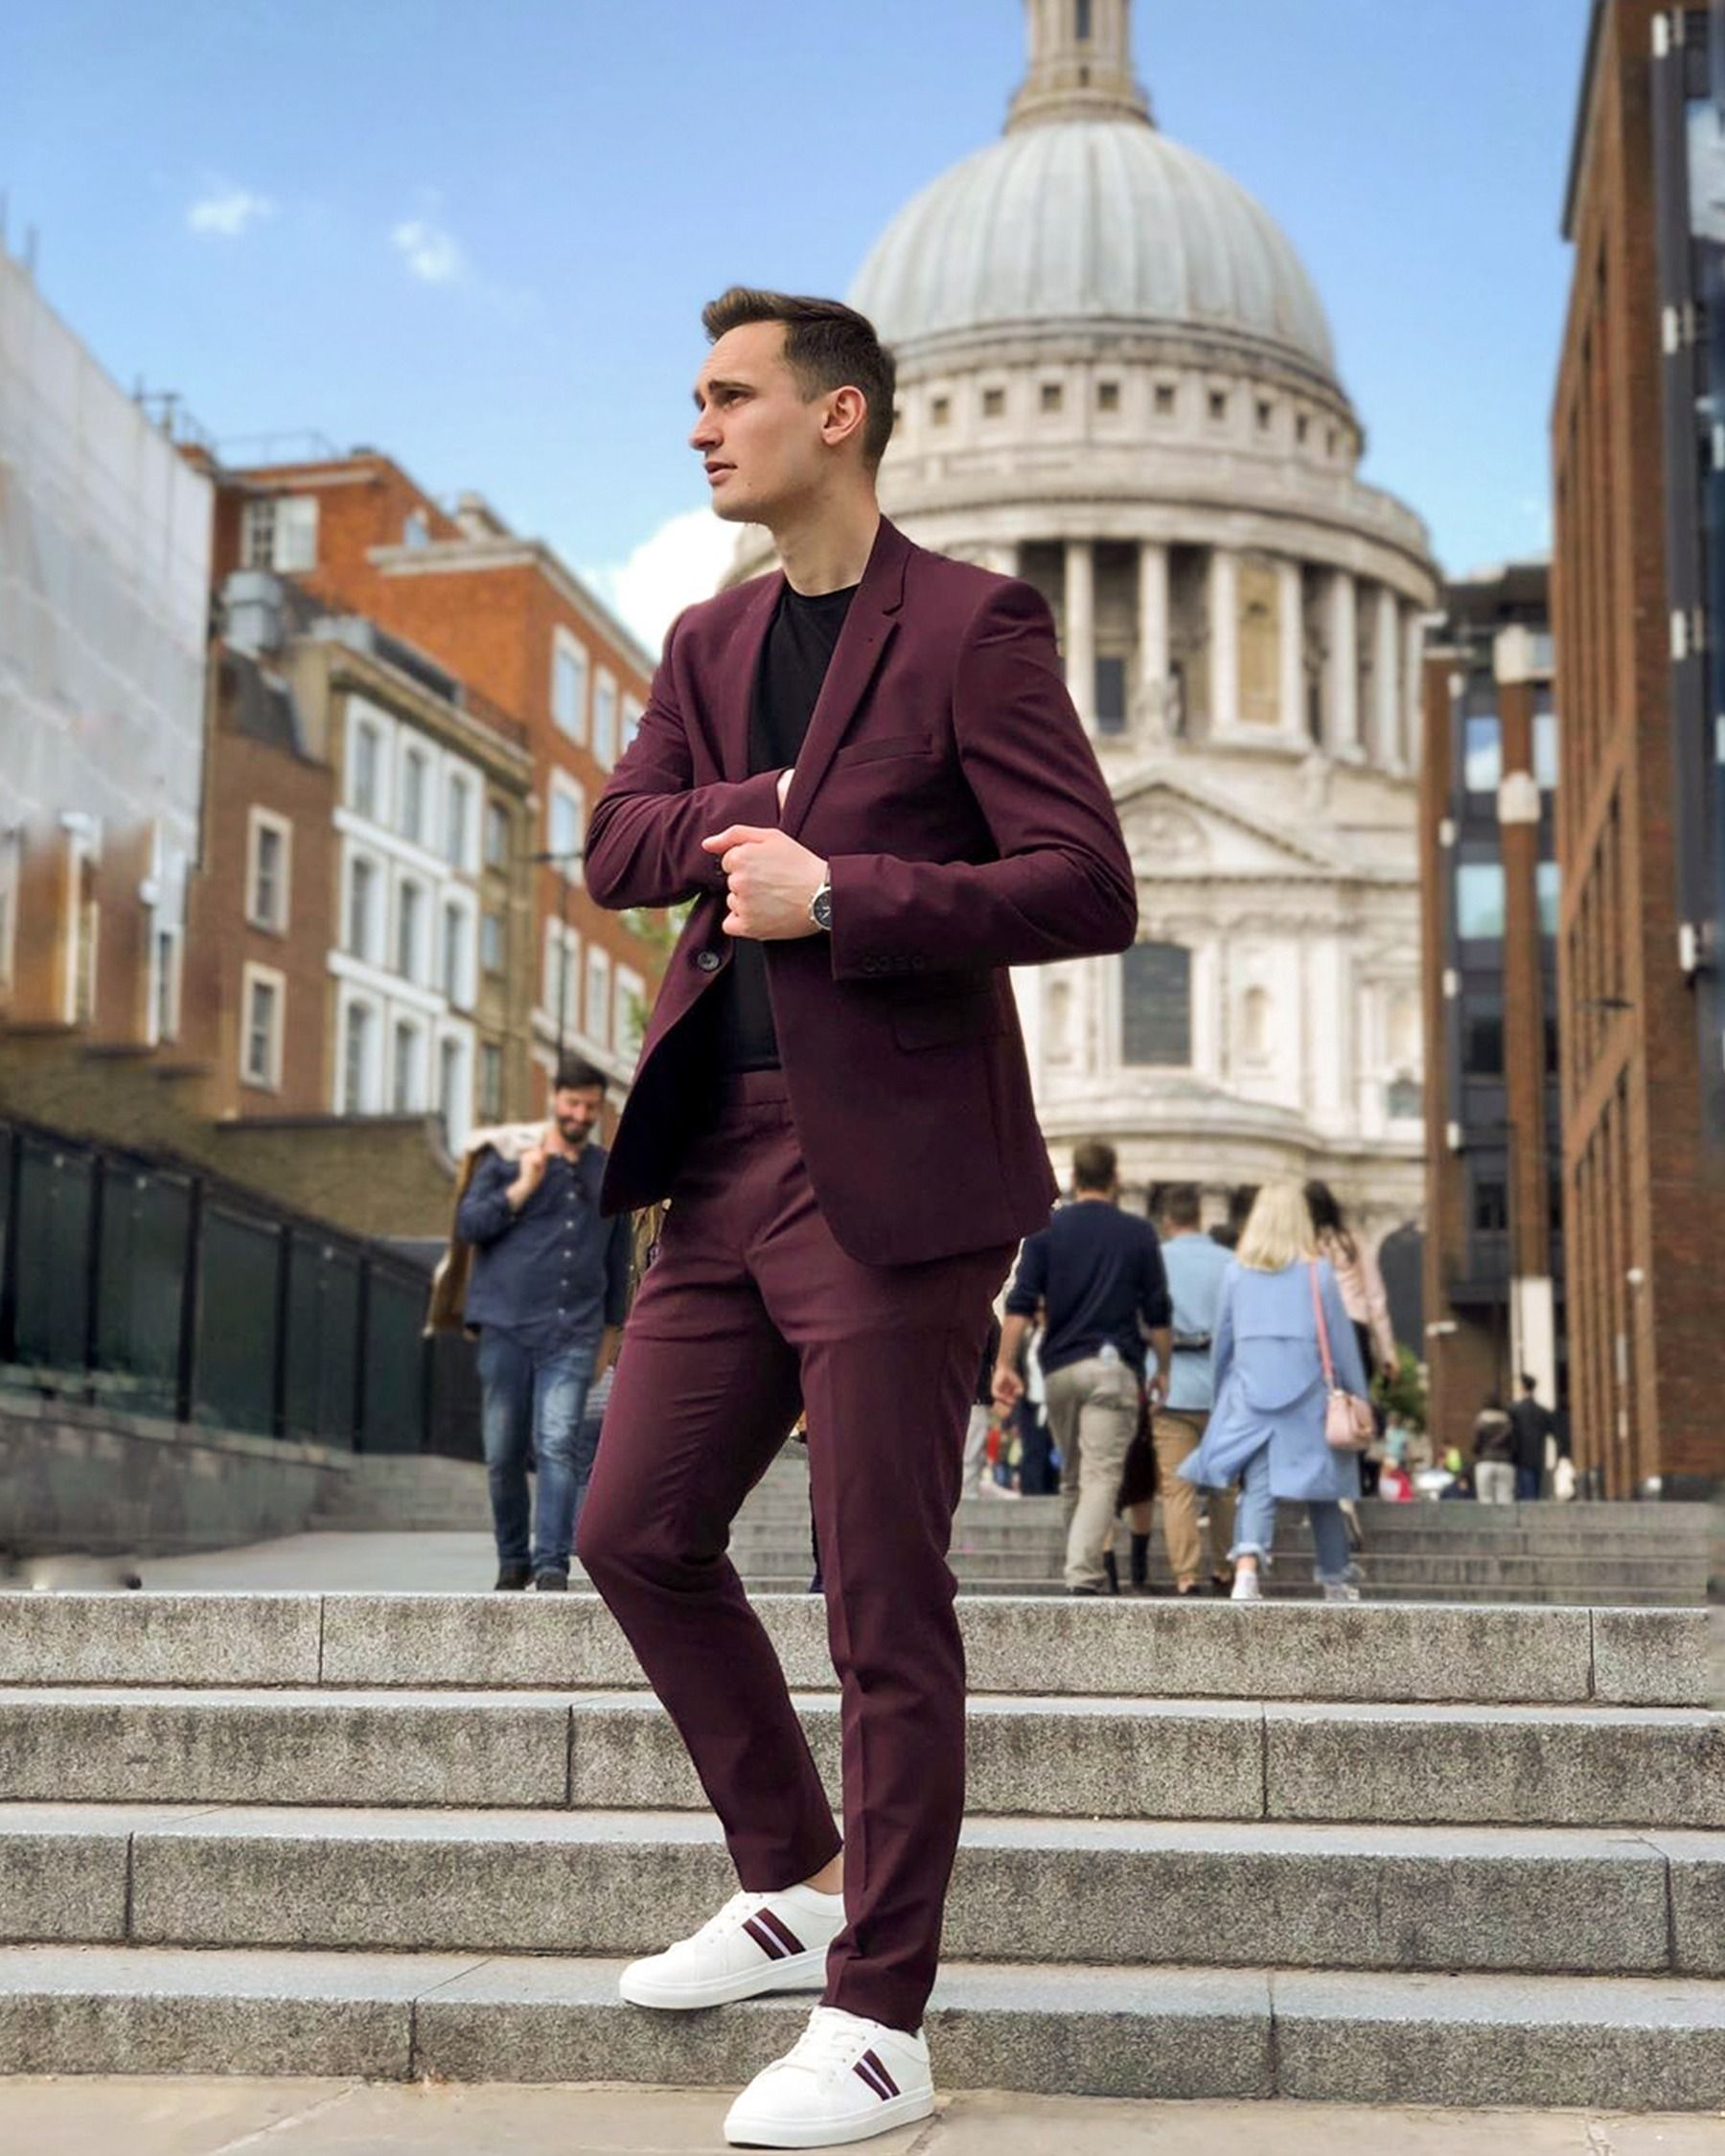 Burgundy suit men